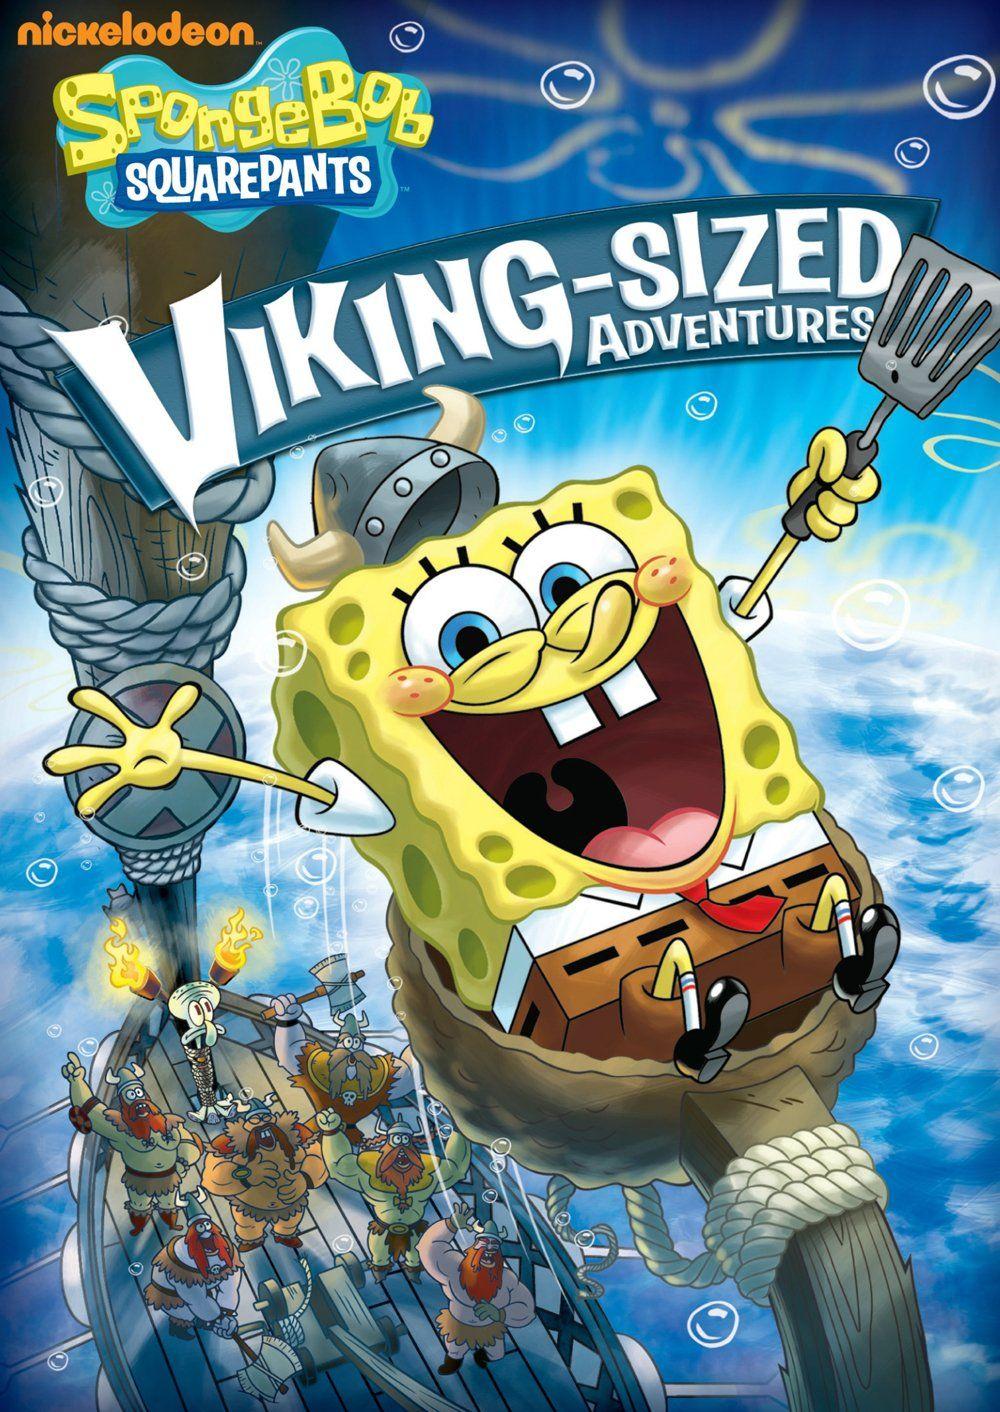 Viking-Sized Adventures